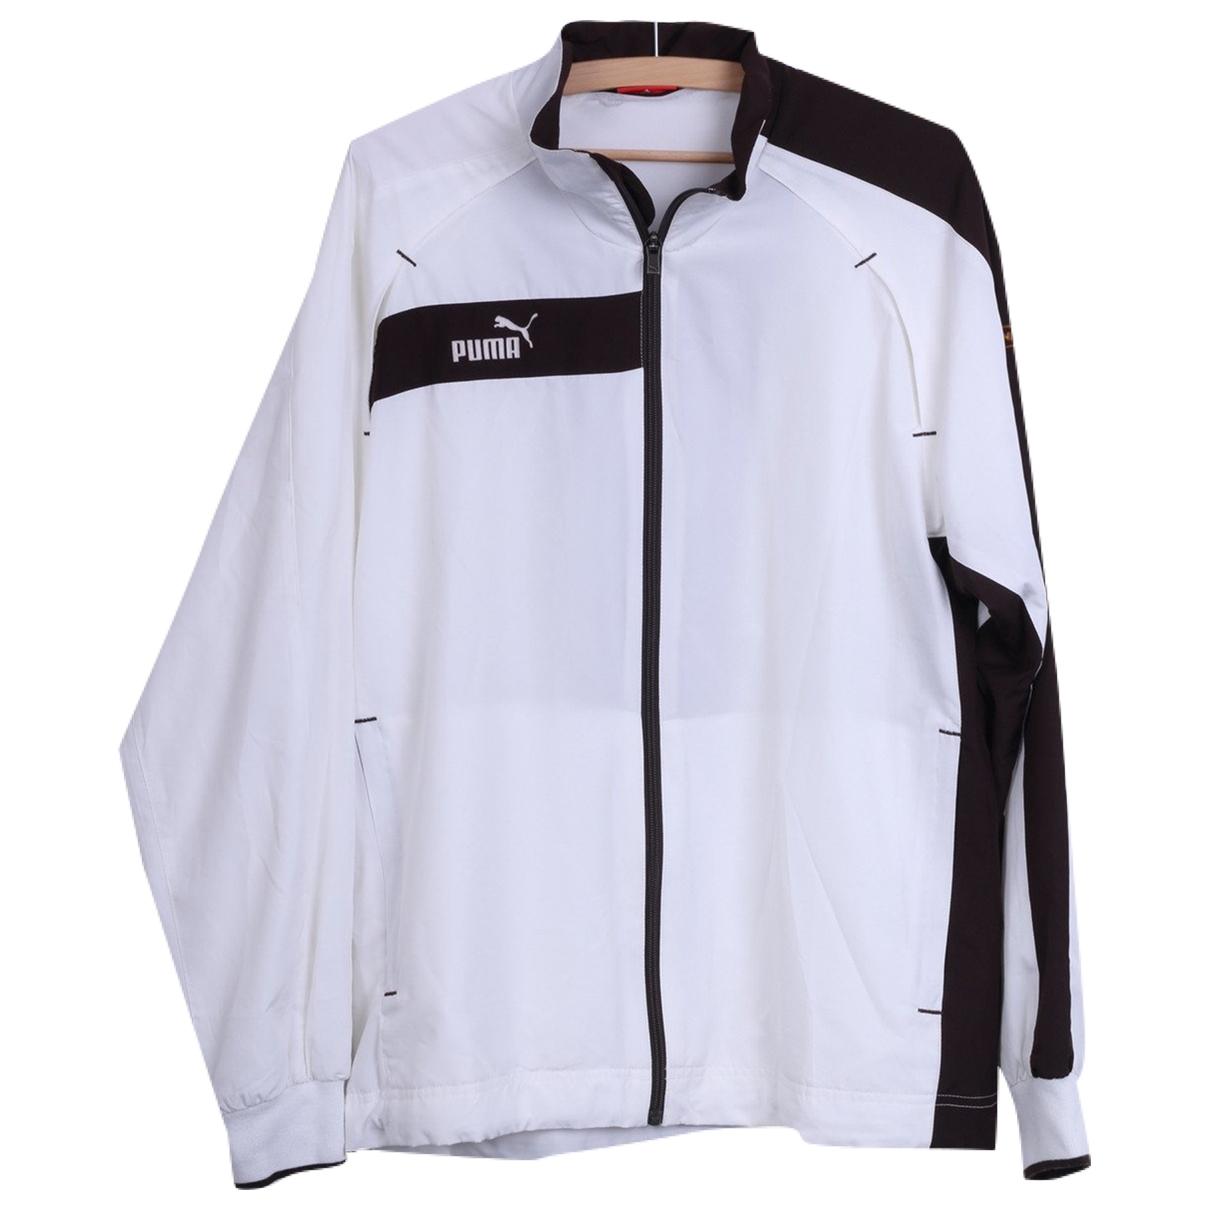 Puma \N White jacket  for Men M International